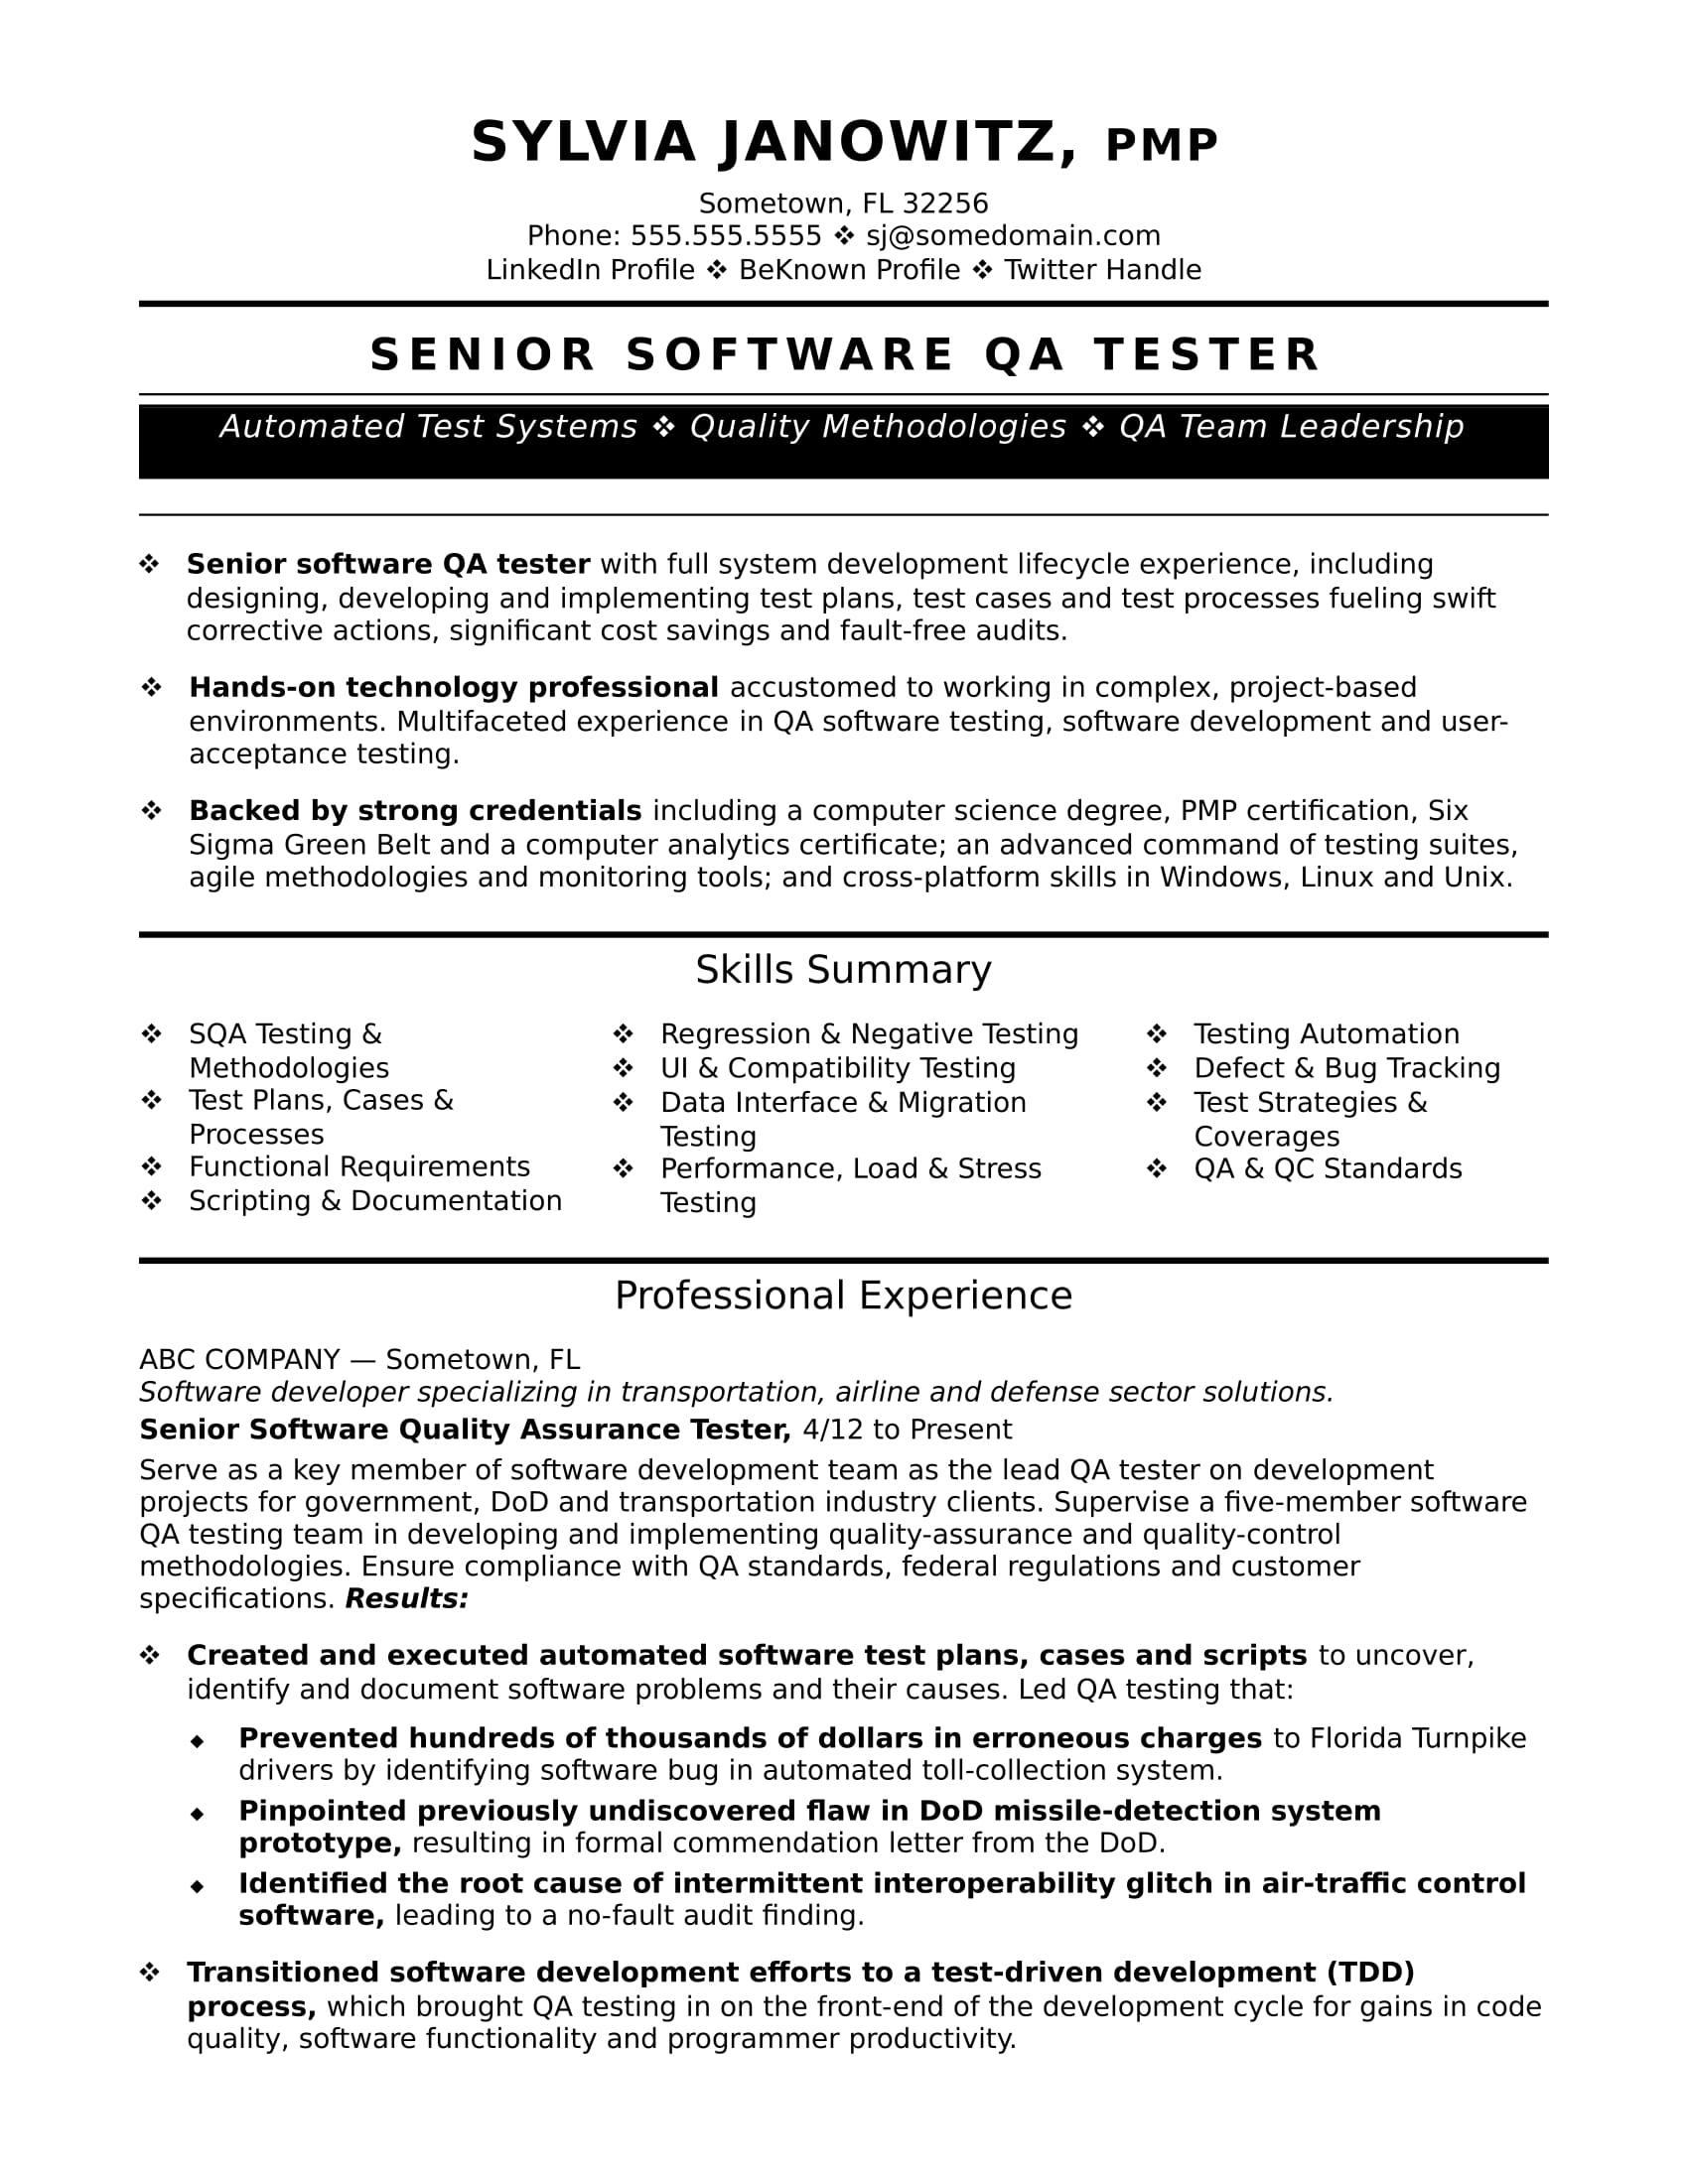 Qa Software Tester Cover Letter